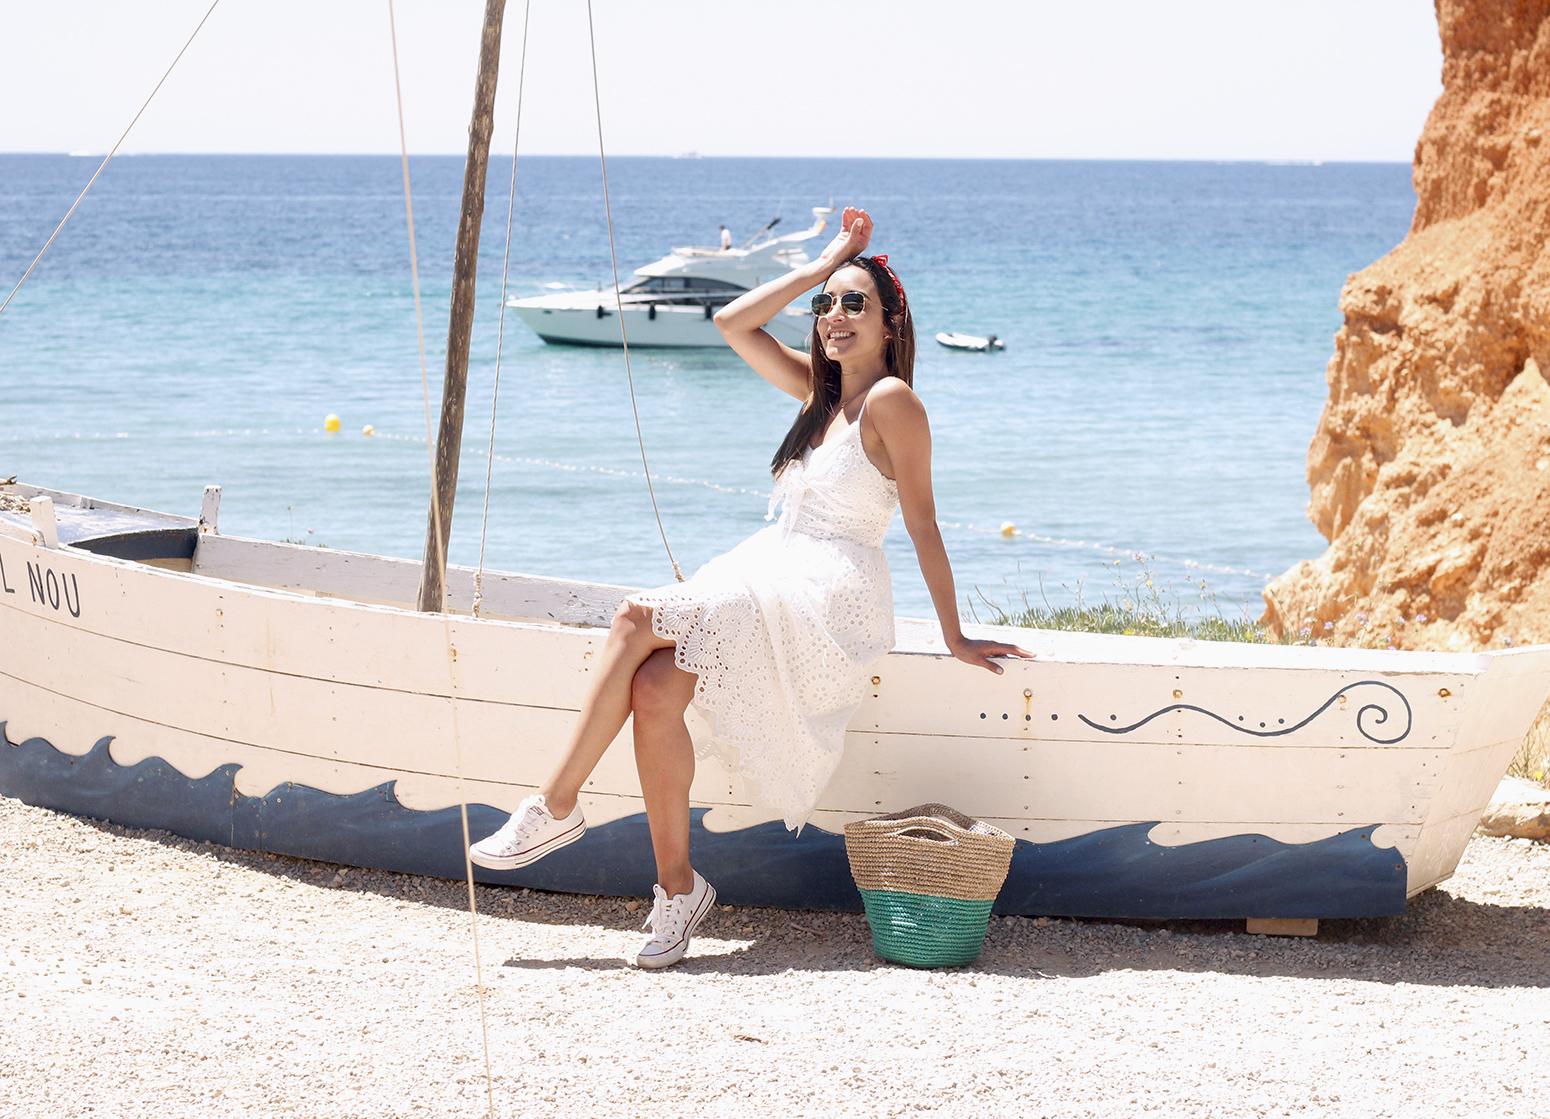 white summer dress white converse rayban sunglasses 2019 street style outfit vacation ibiza4